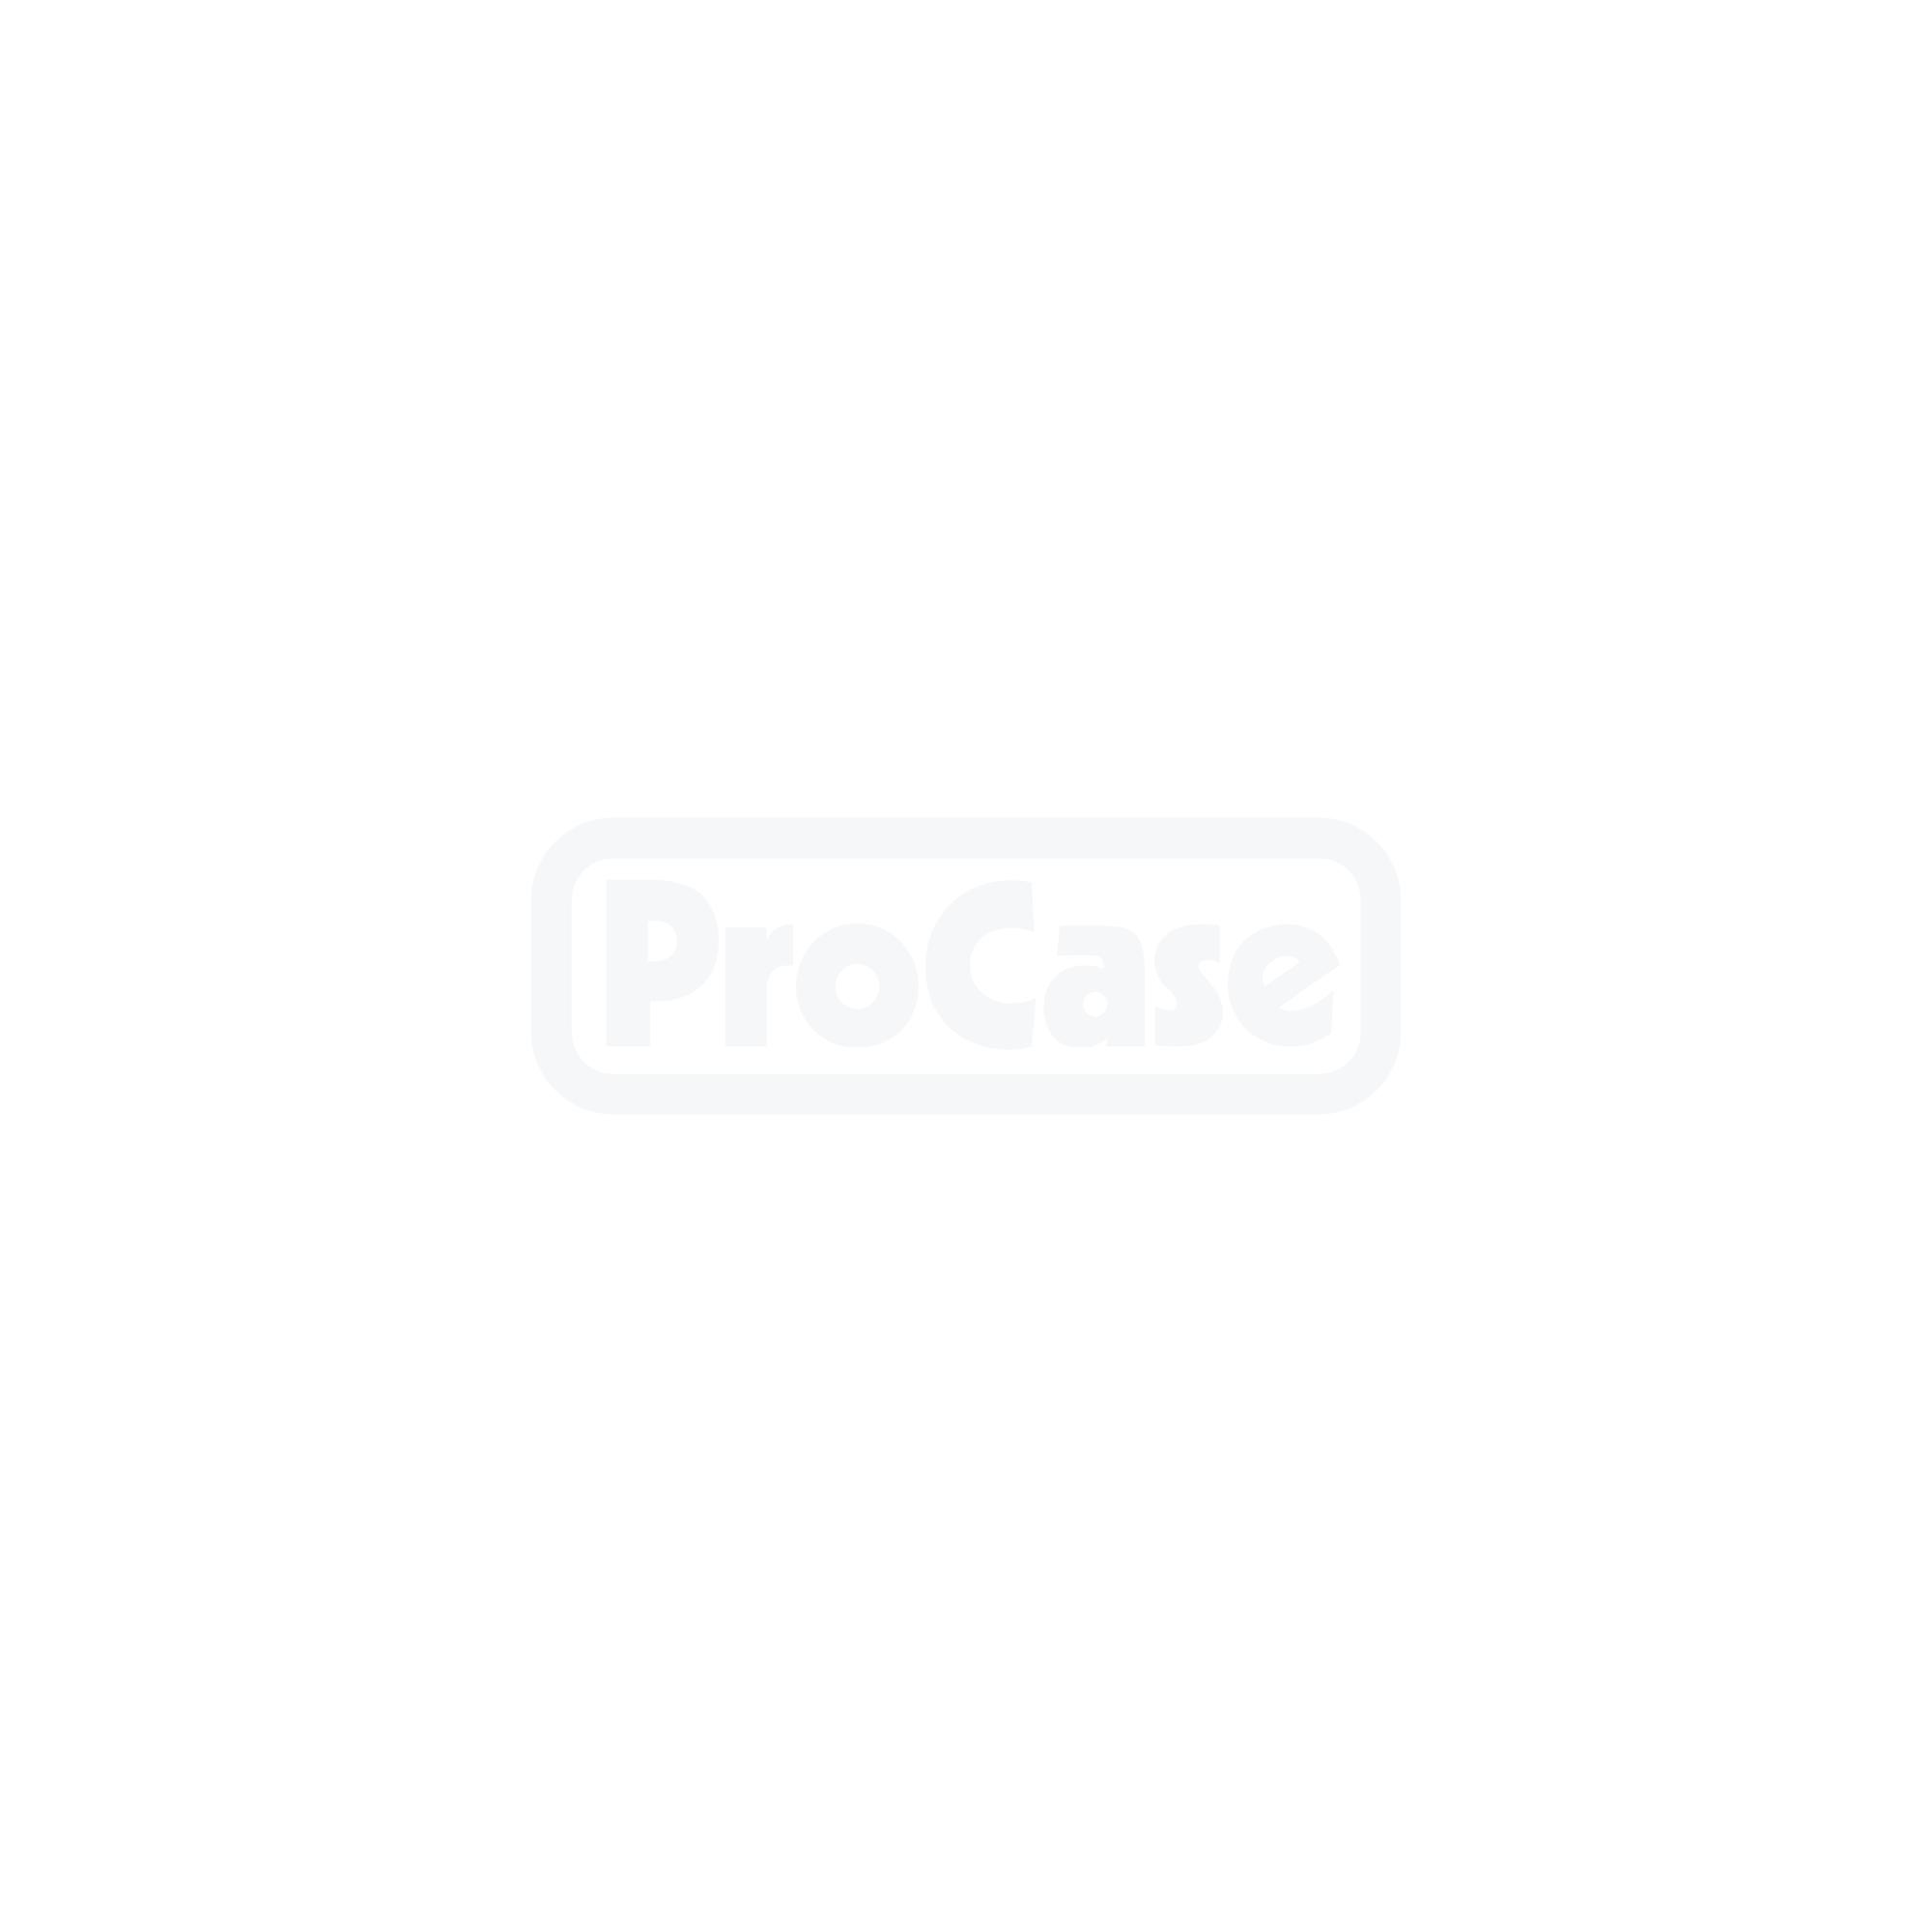 Flightcase für 4x JBLED A7 Zoom / JBLED A4 Zoom 2